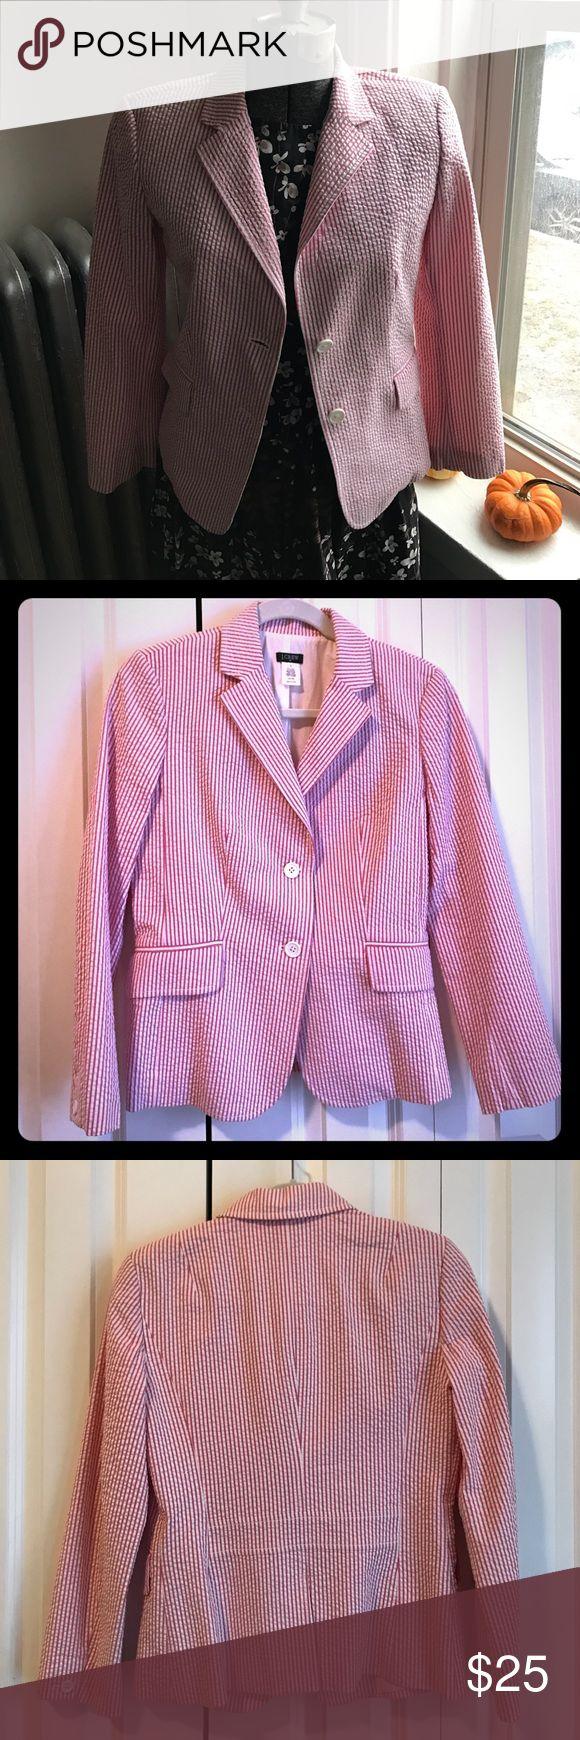 Pink and white J. crew searsucker suit jacket Pink and white sear sucker suit jacket. From J. Crew. Like new. J. Crew Jackets & Coats Blazers